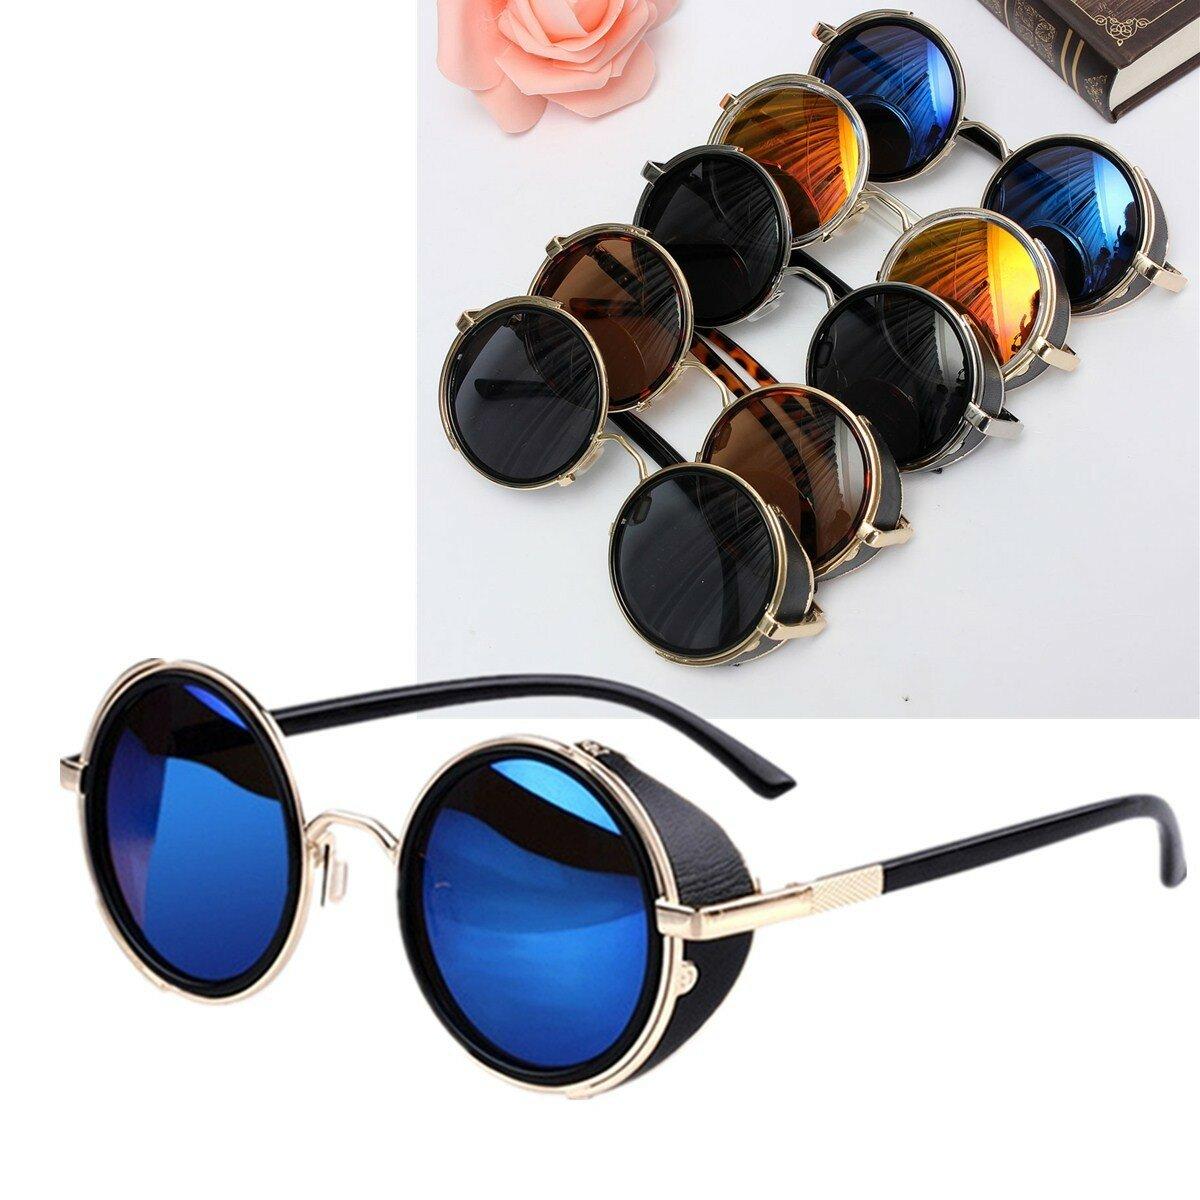 Okulary przeciwsłoneczne unisex Vintage UV400 Steampunk Round Mirror Lens Glasses